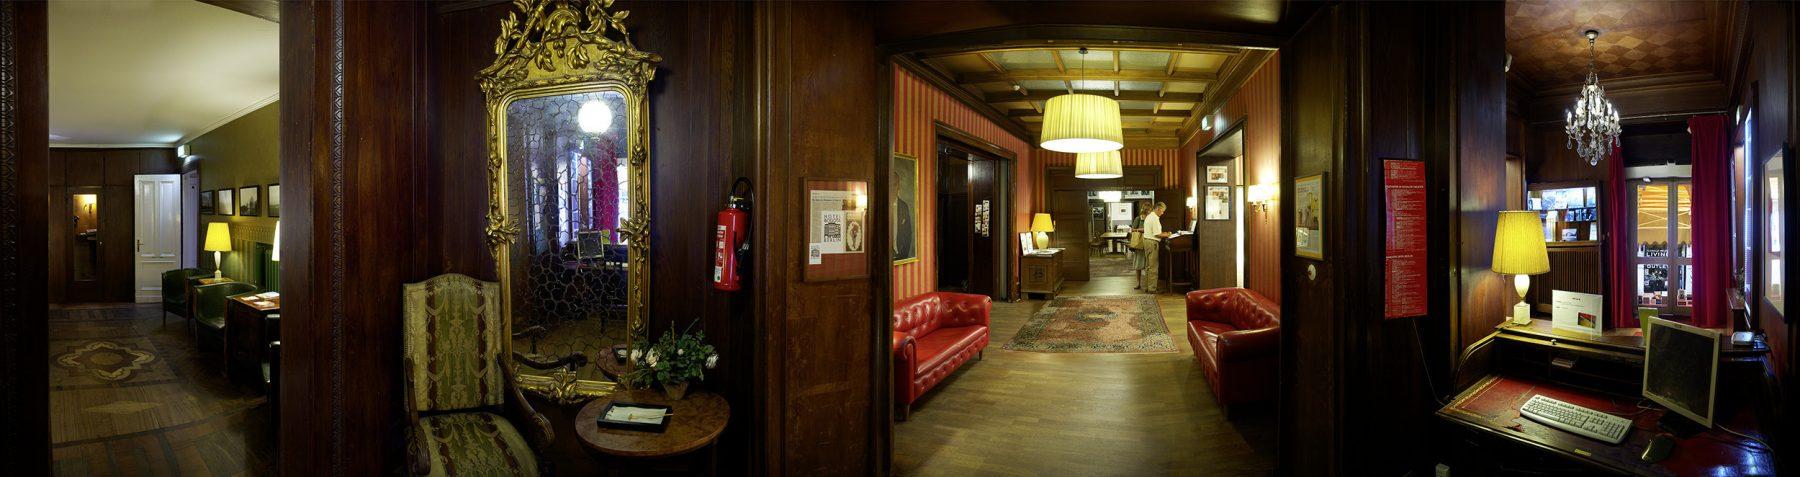 Hotel Bogota Rotes Kabinett